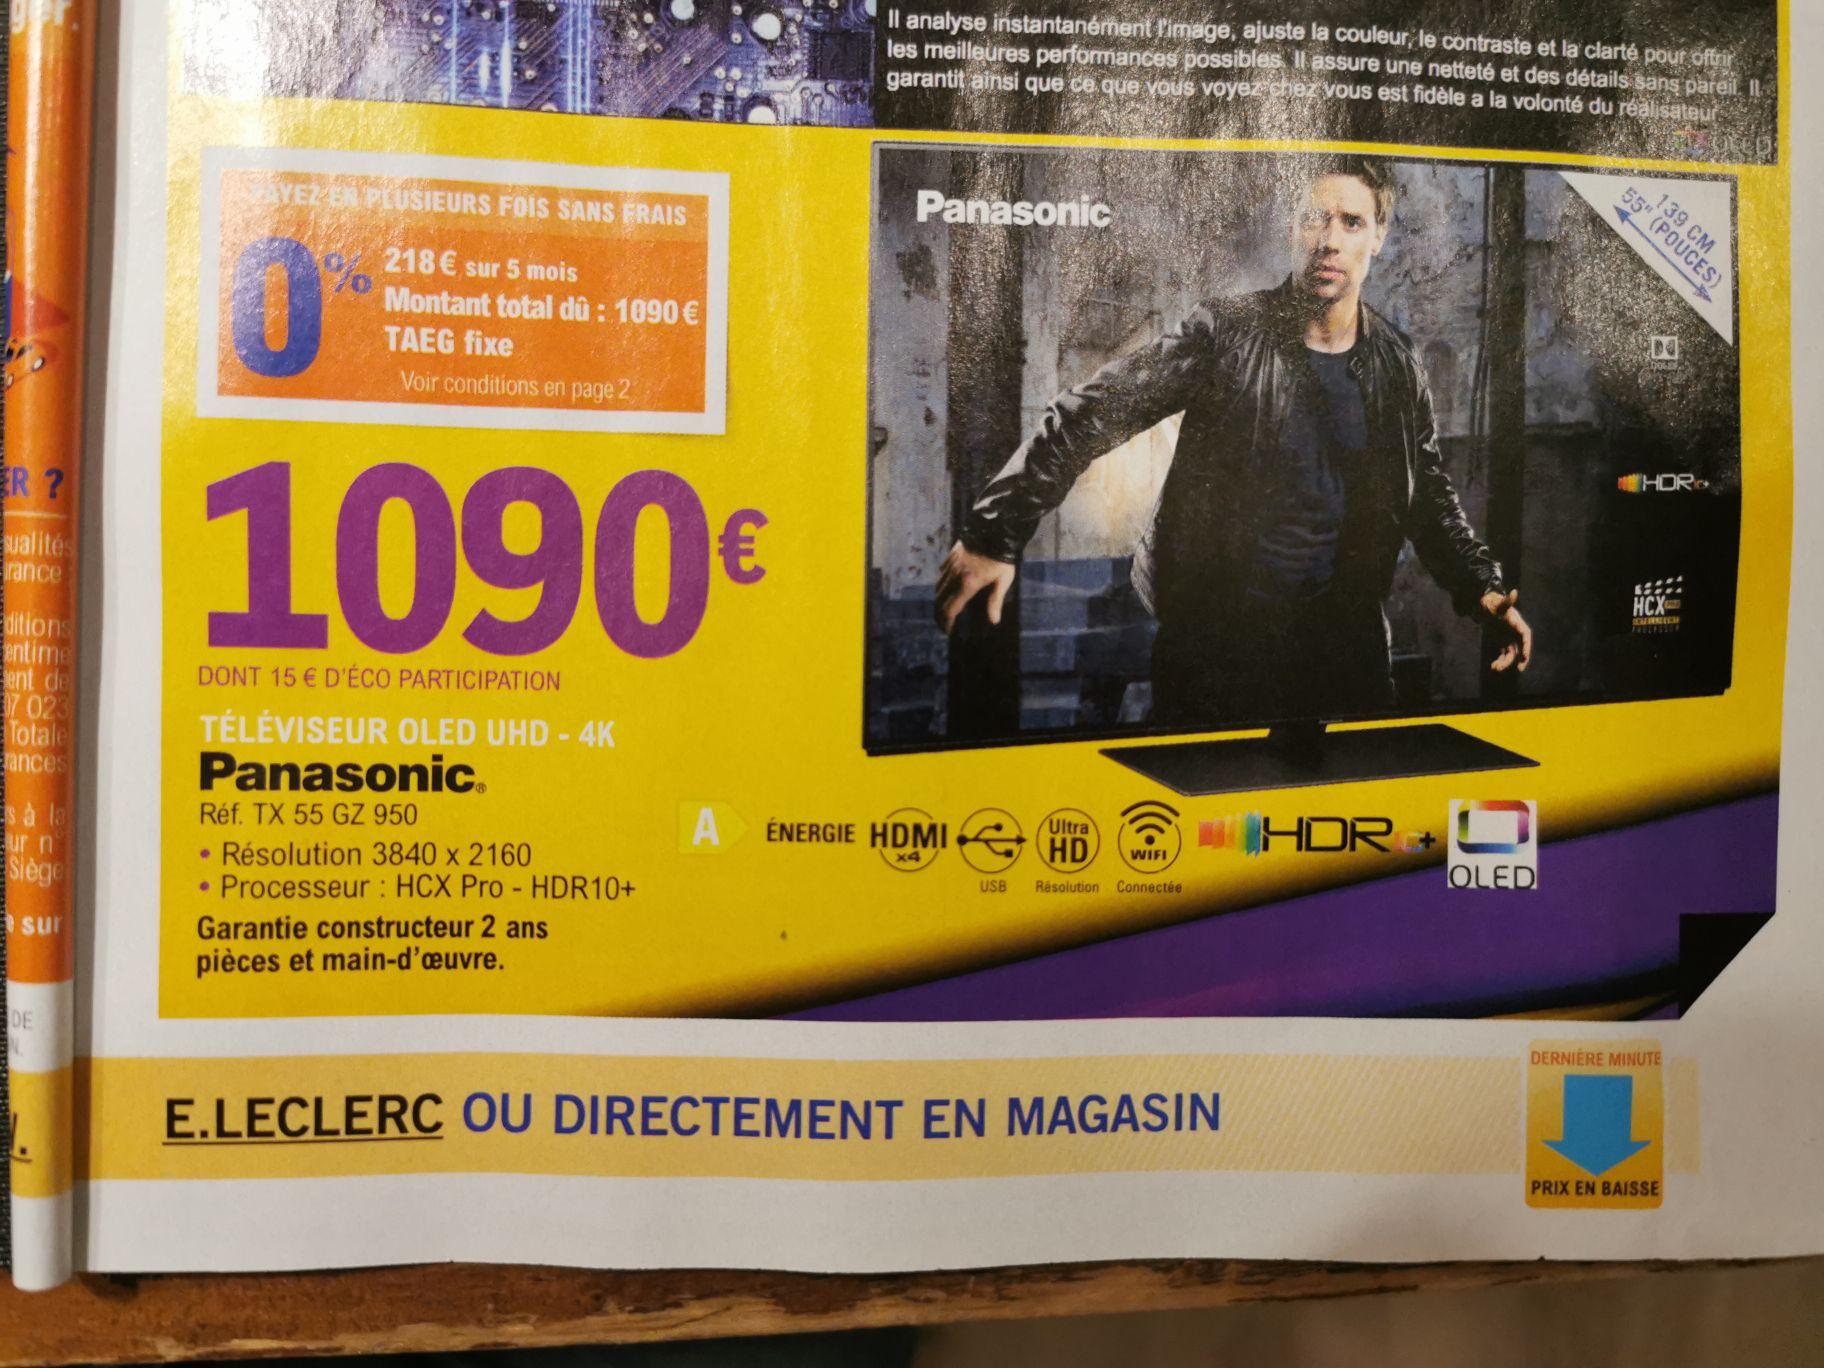 "TV OLED 55"" Panasonic TX-55GZ950E - 4K UHD, HDR 10+, Dolby Vision, Smart TV - Sélection de magasins"